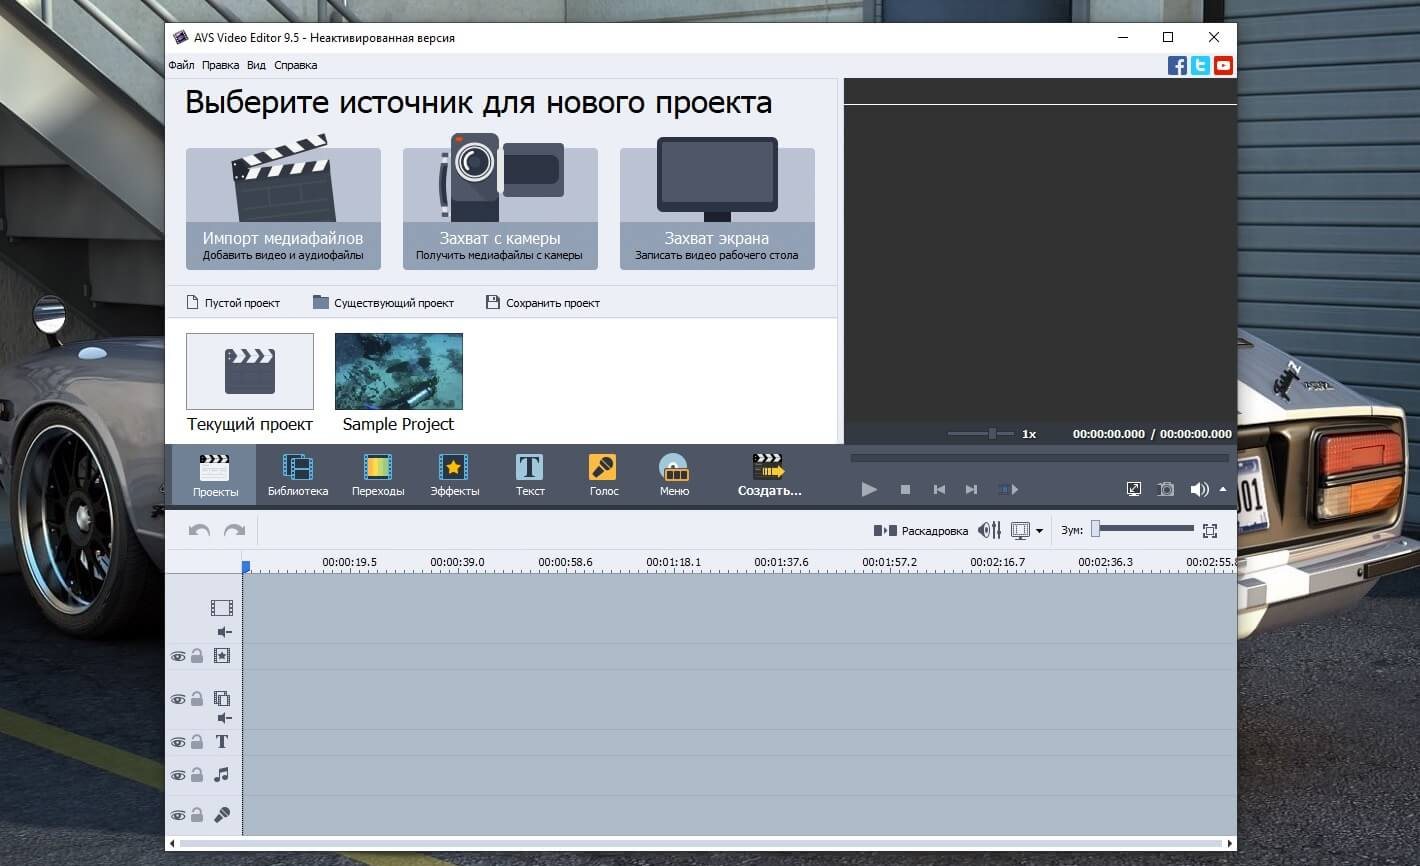 AVS Video Editor Видео редактор